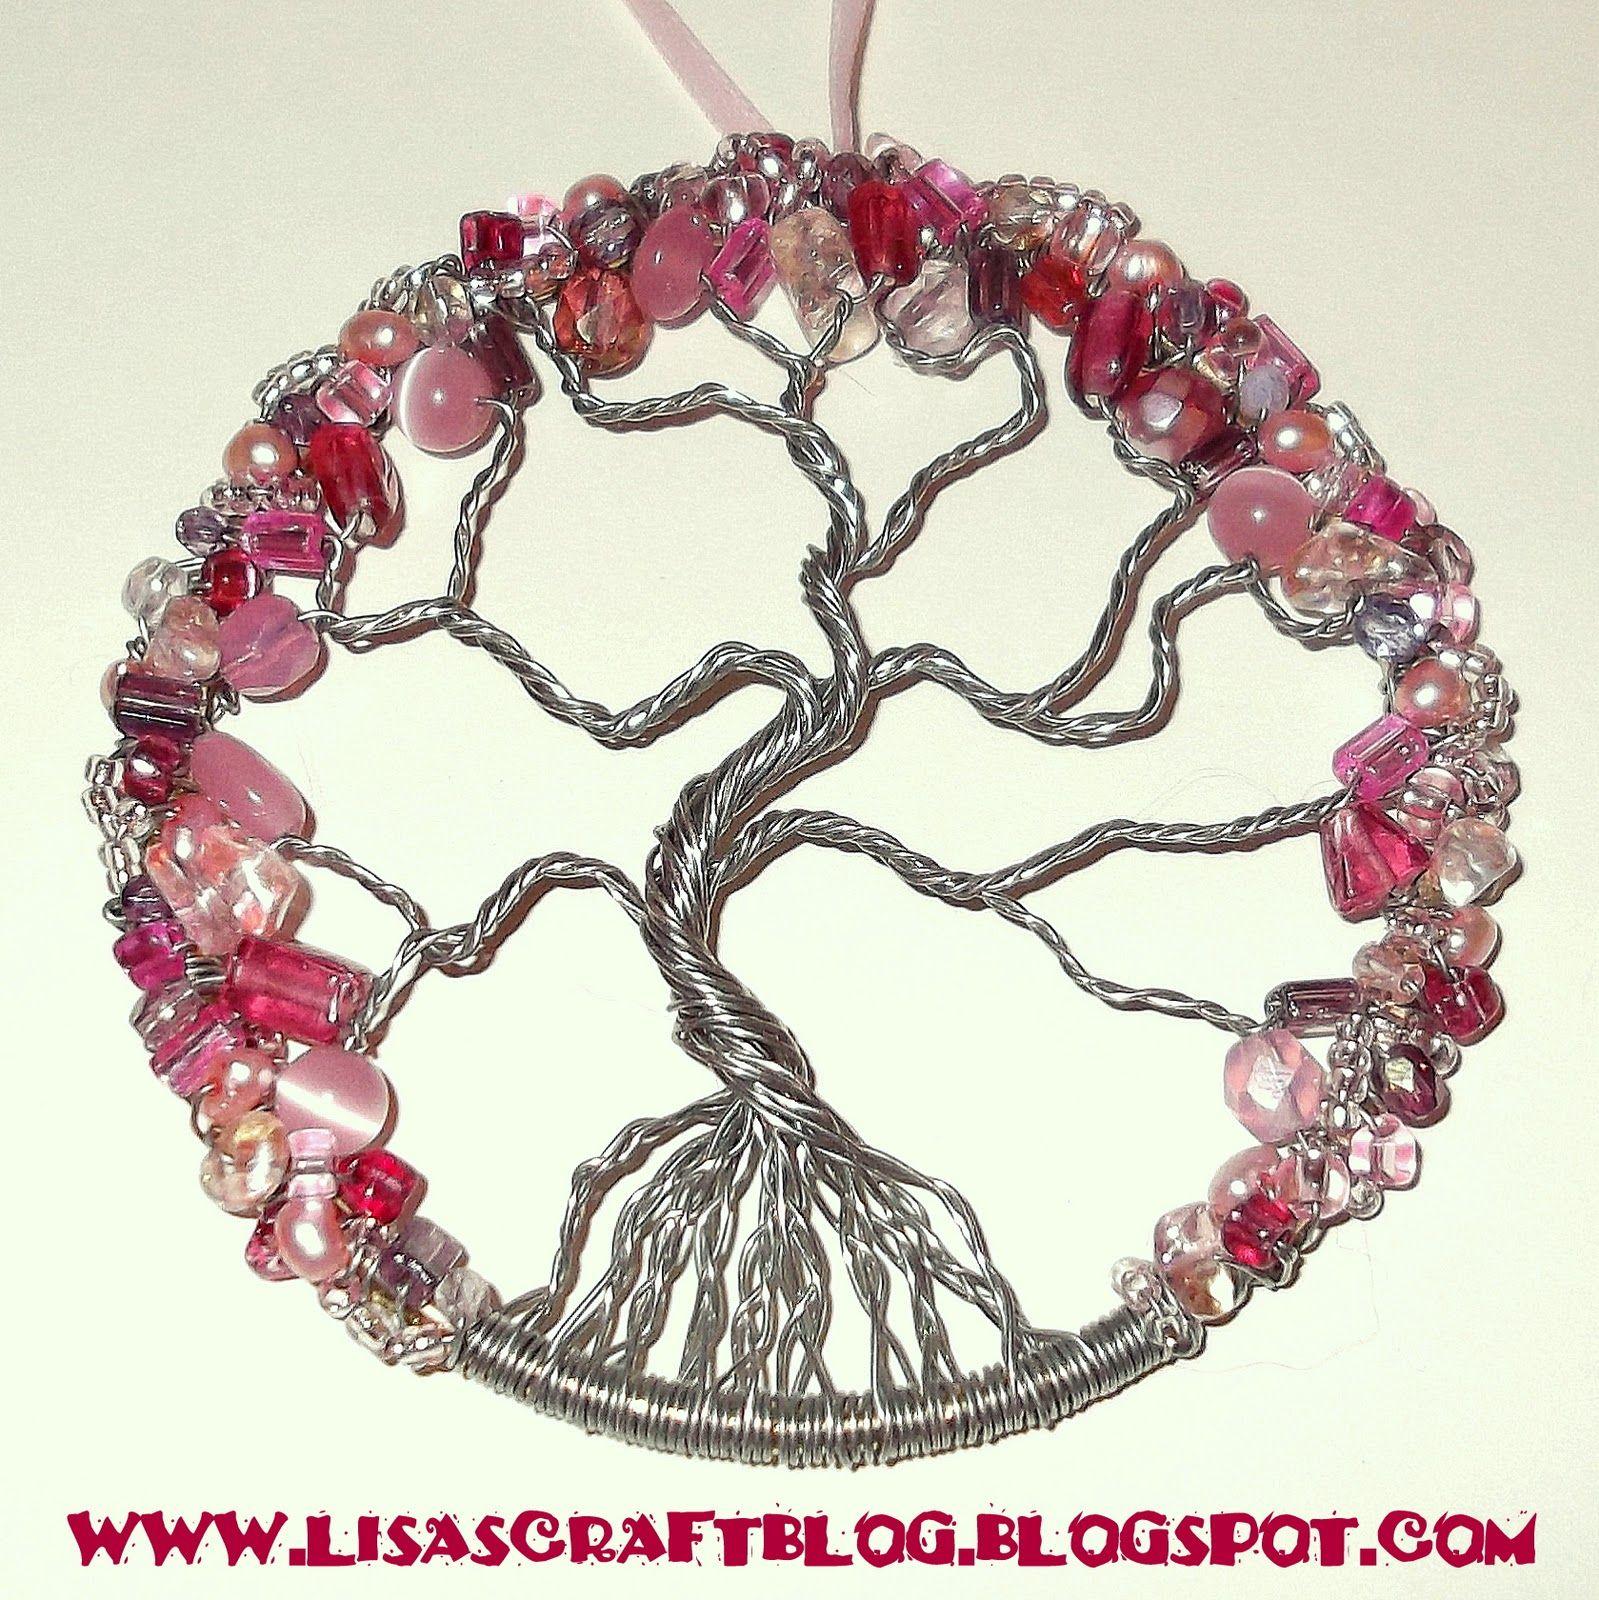 Tree of life ornament - Tree Of Life Ornament 32